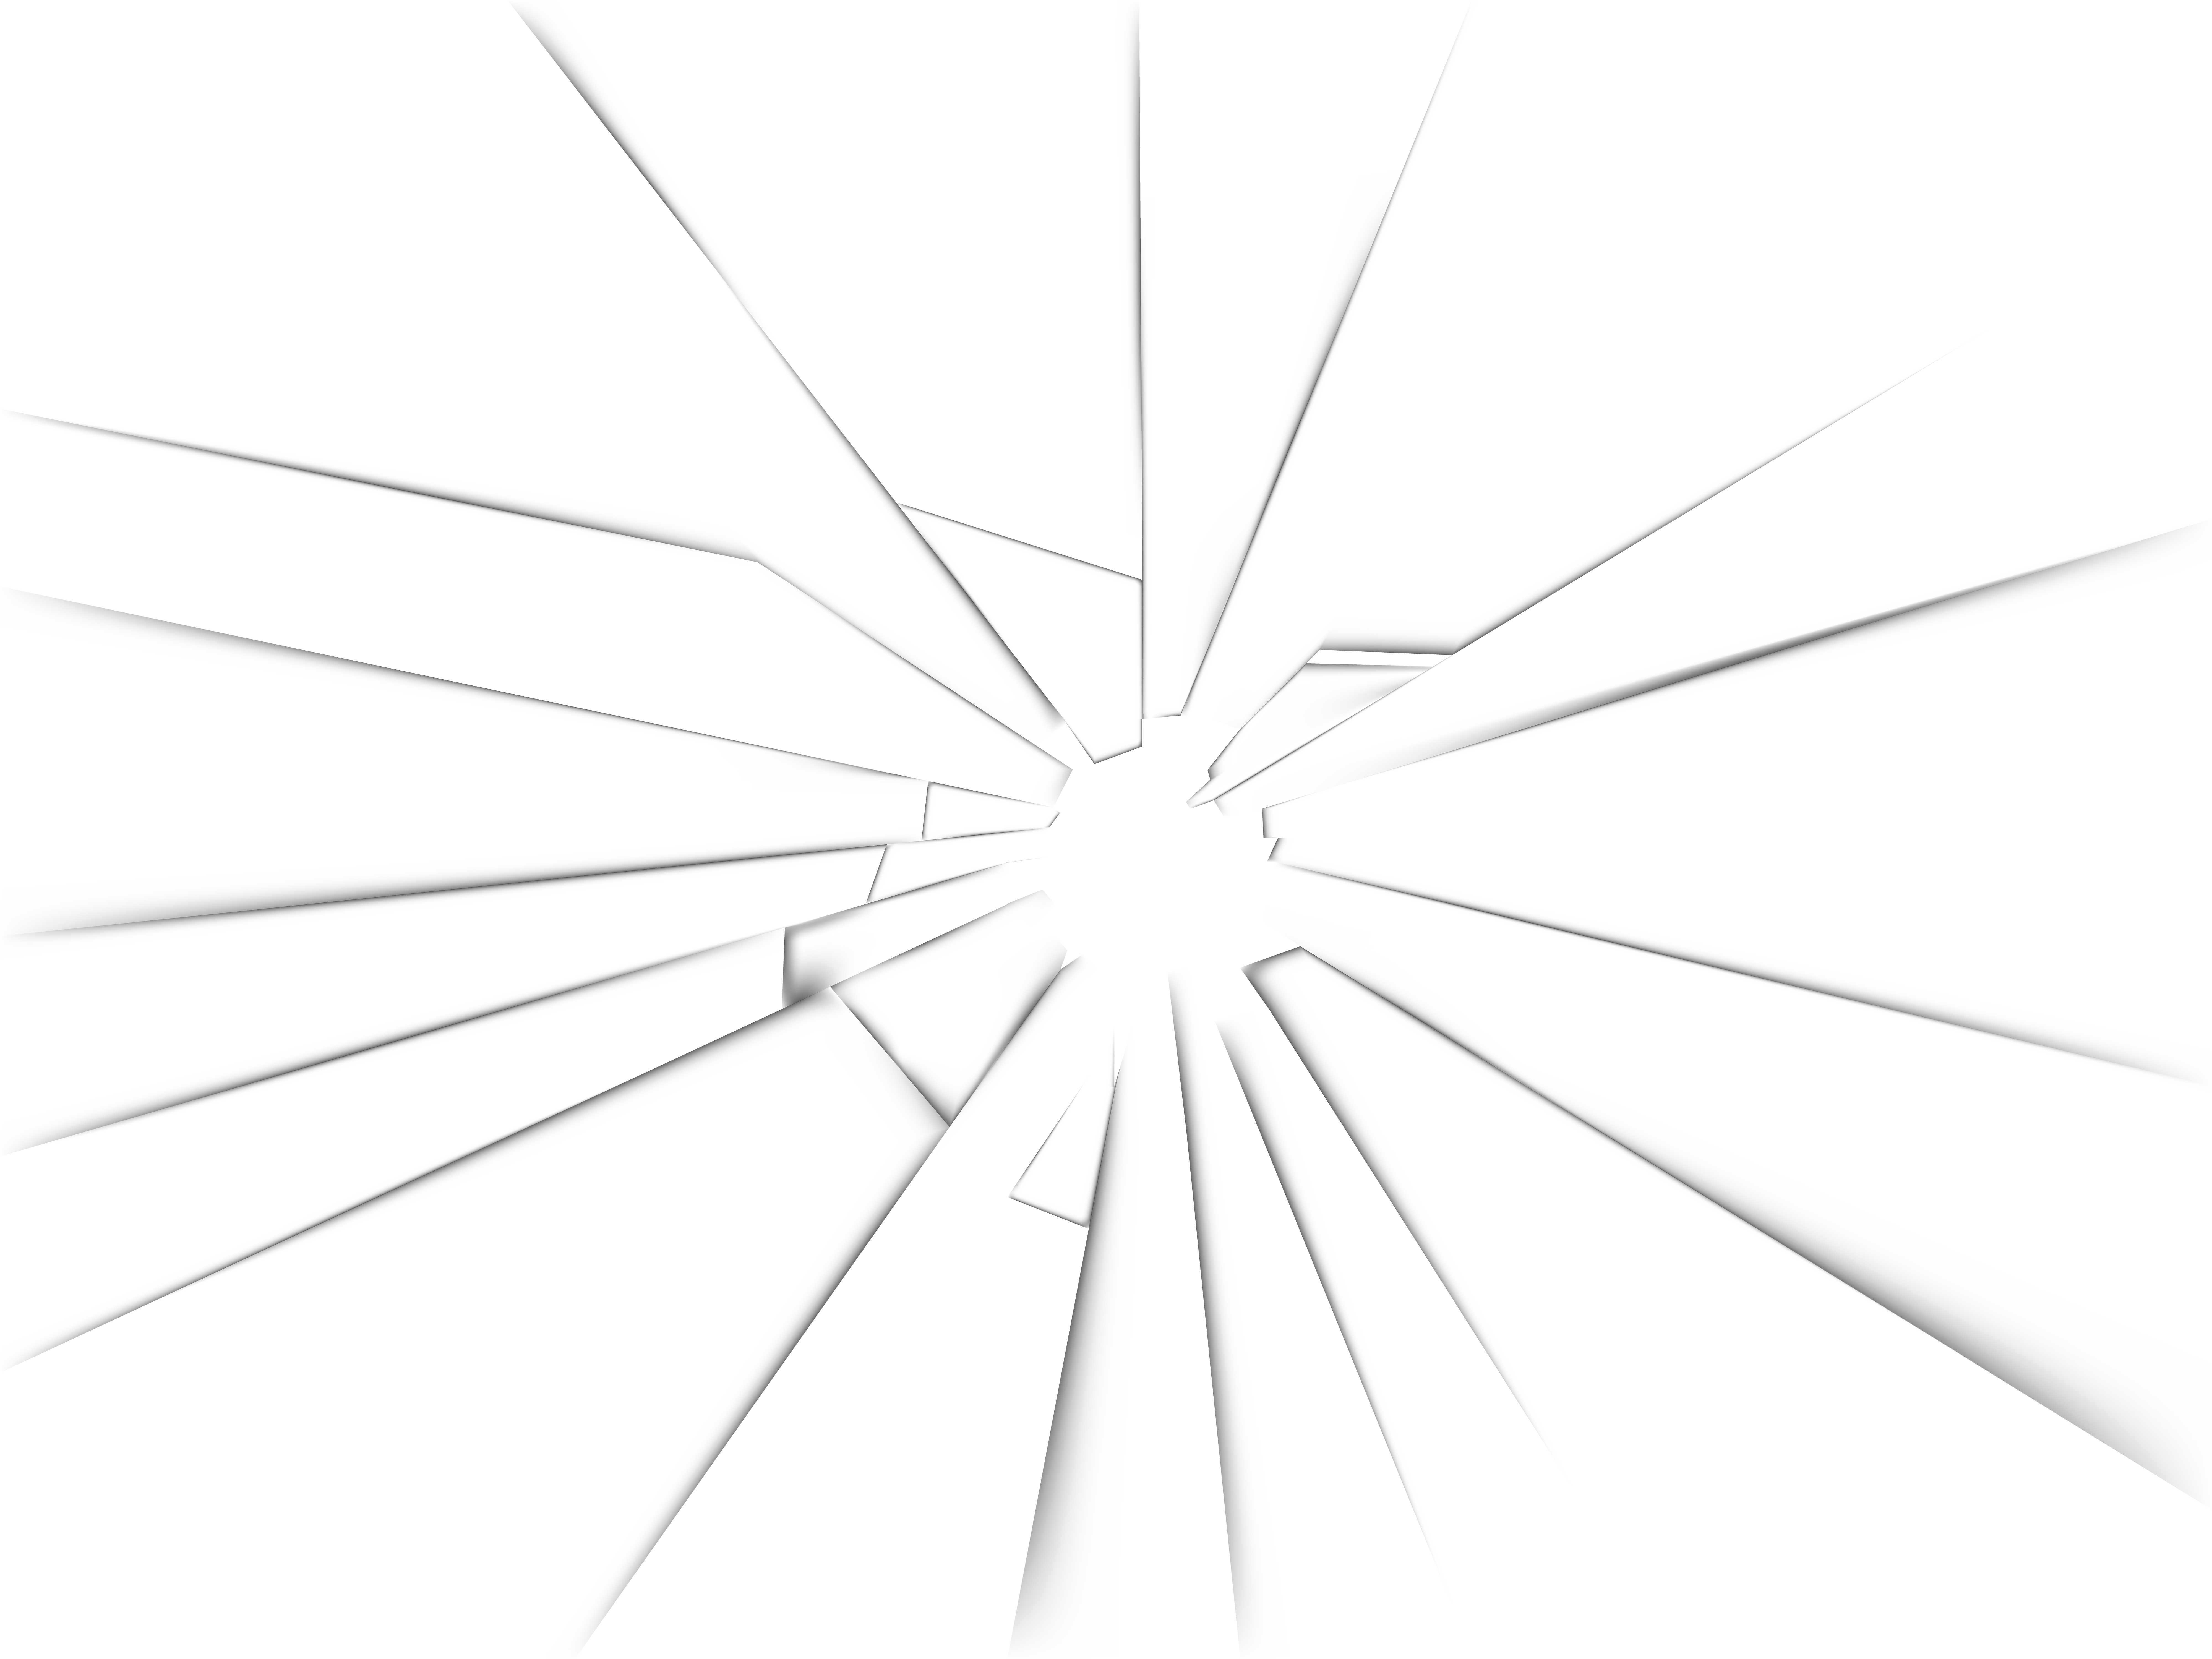 Broken Glass Transparent Png Clip Art Image Broken Glass Art Broken Glass Glass